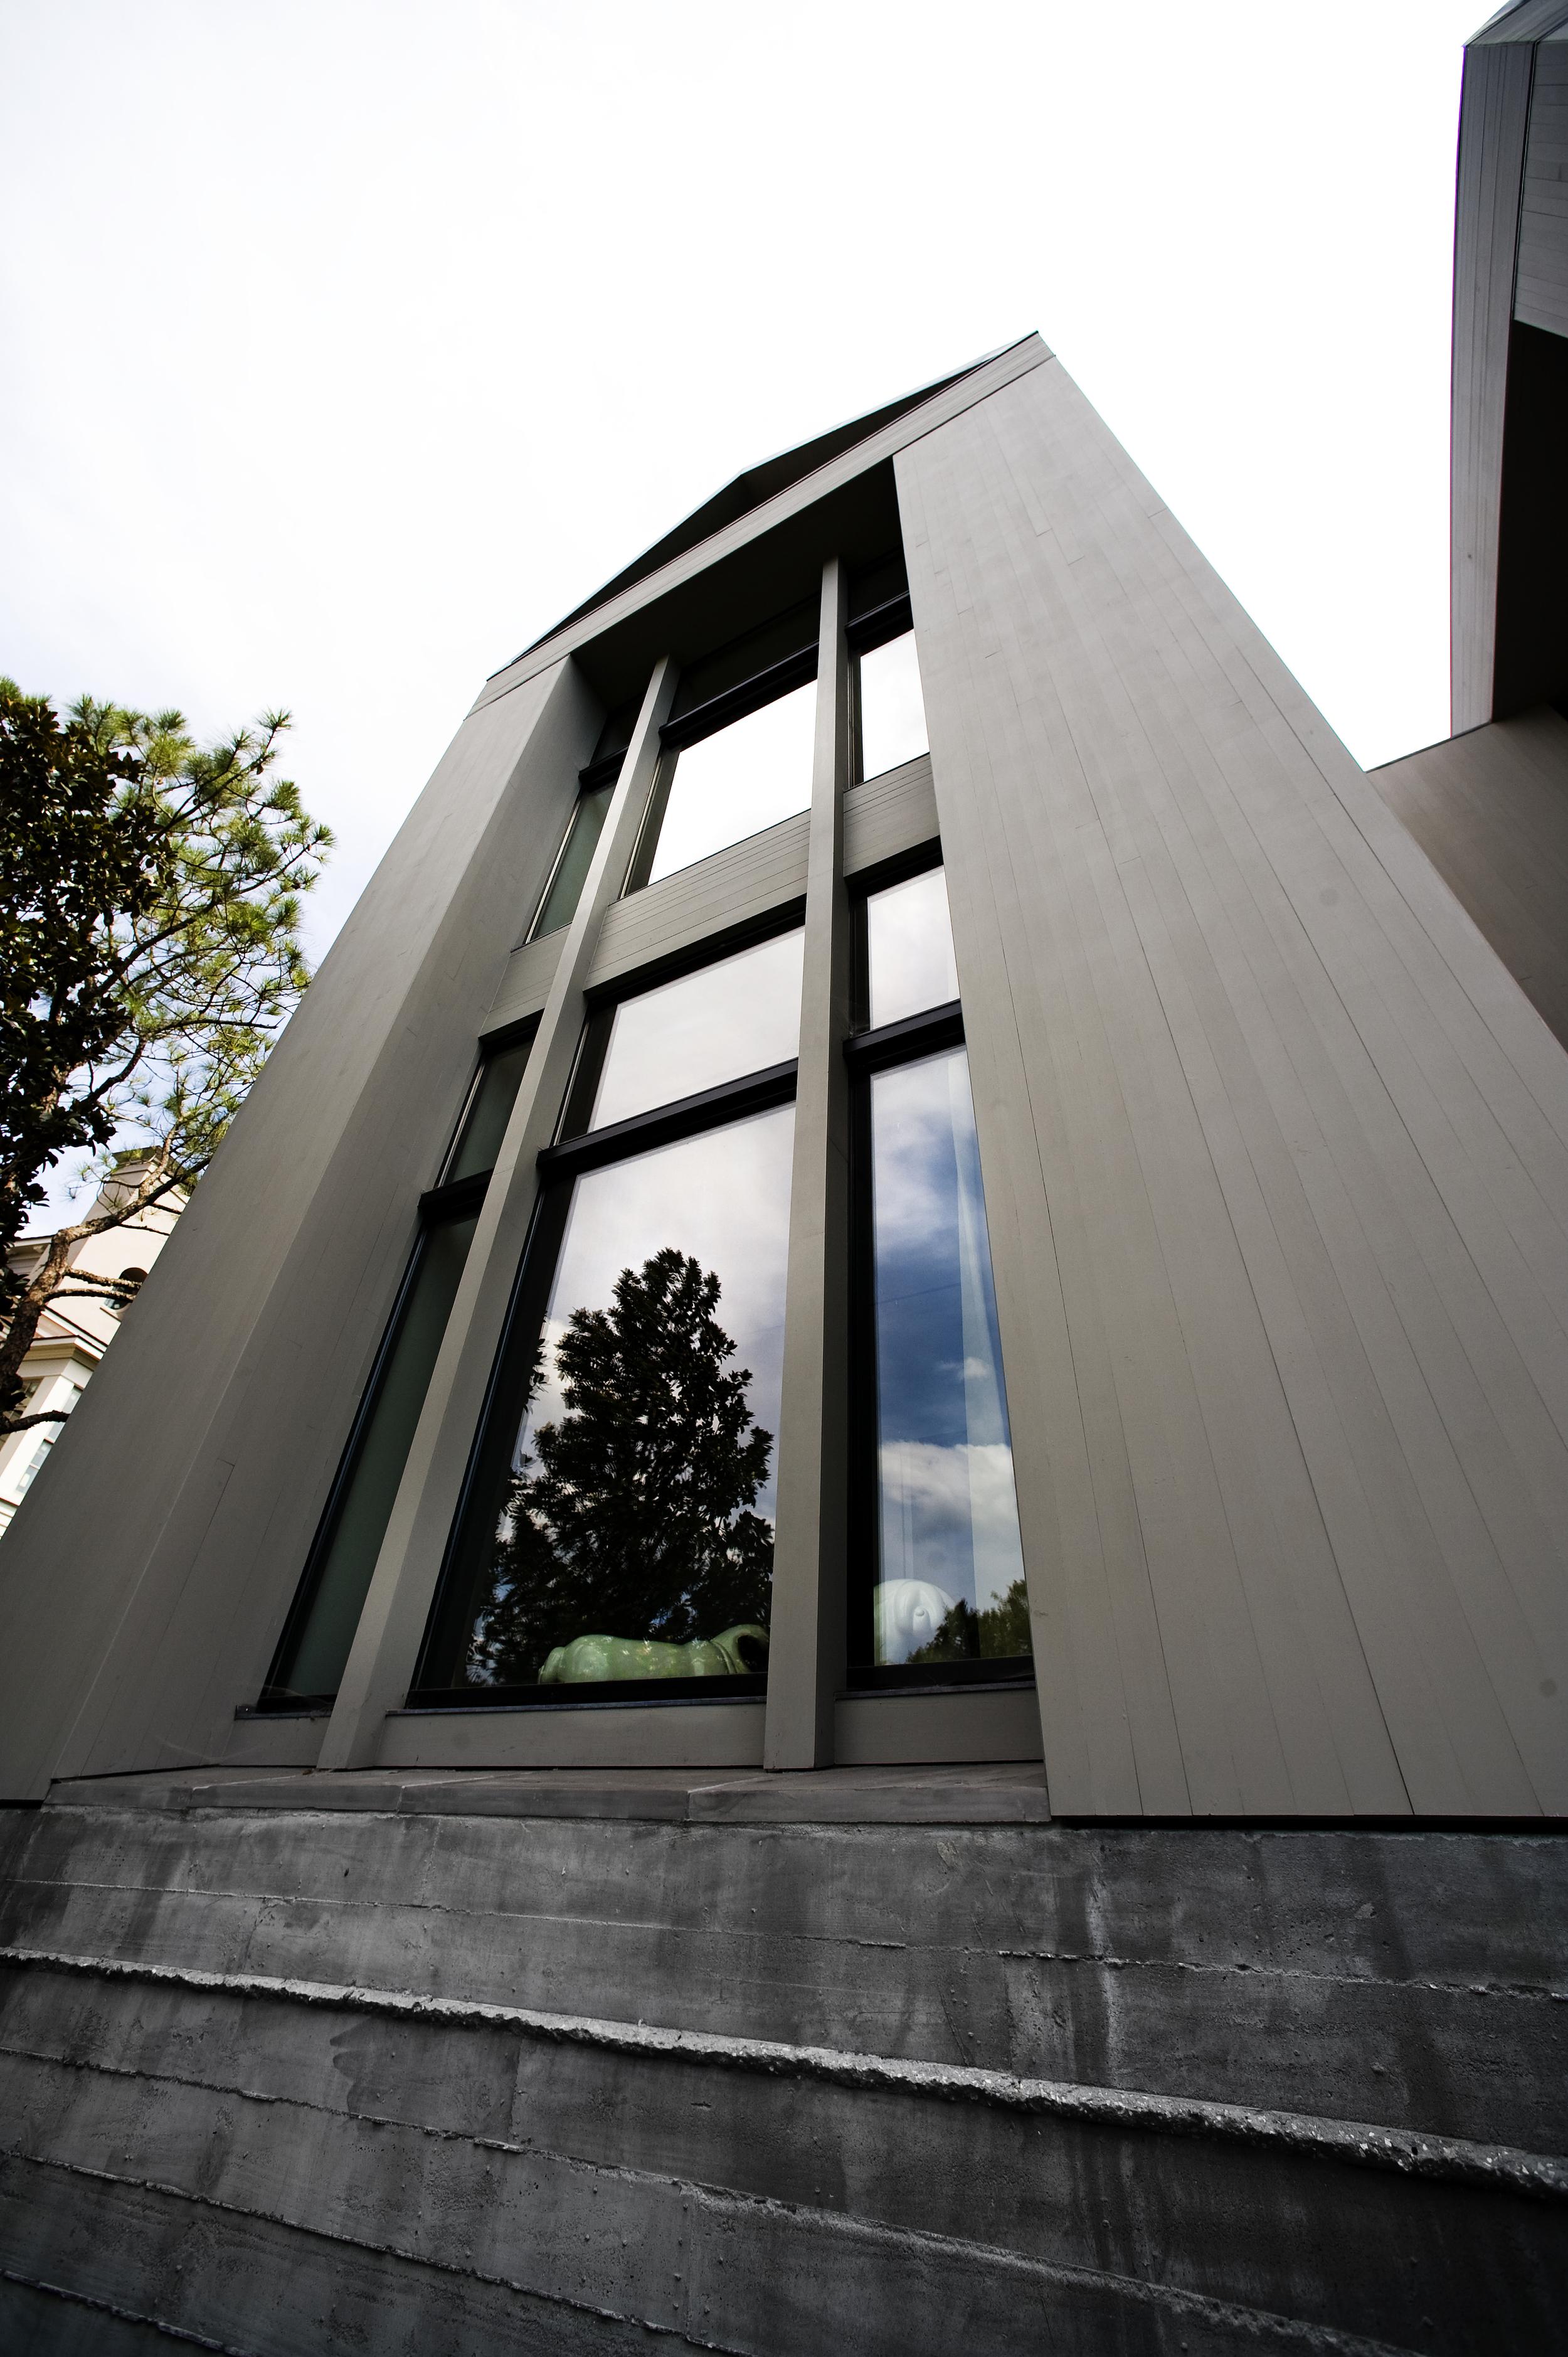 30 foot impact glass Meranti Wood Fixed Window